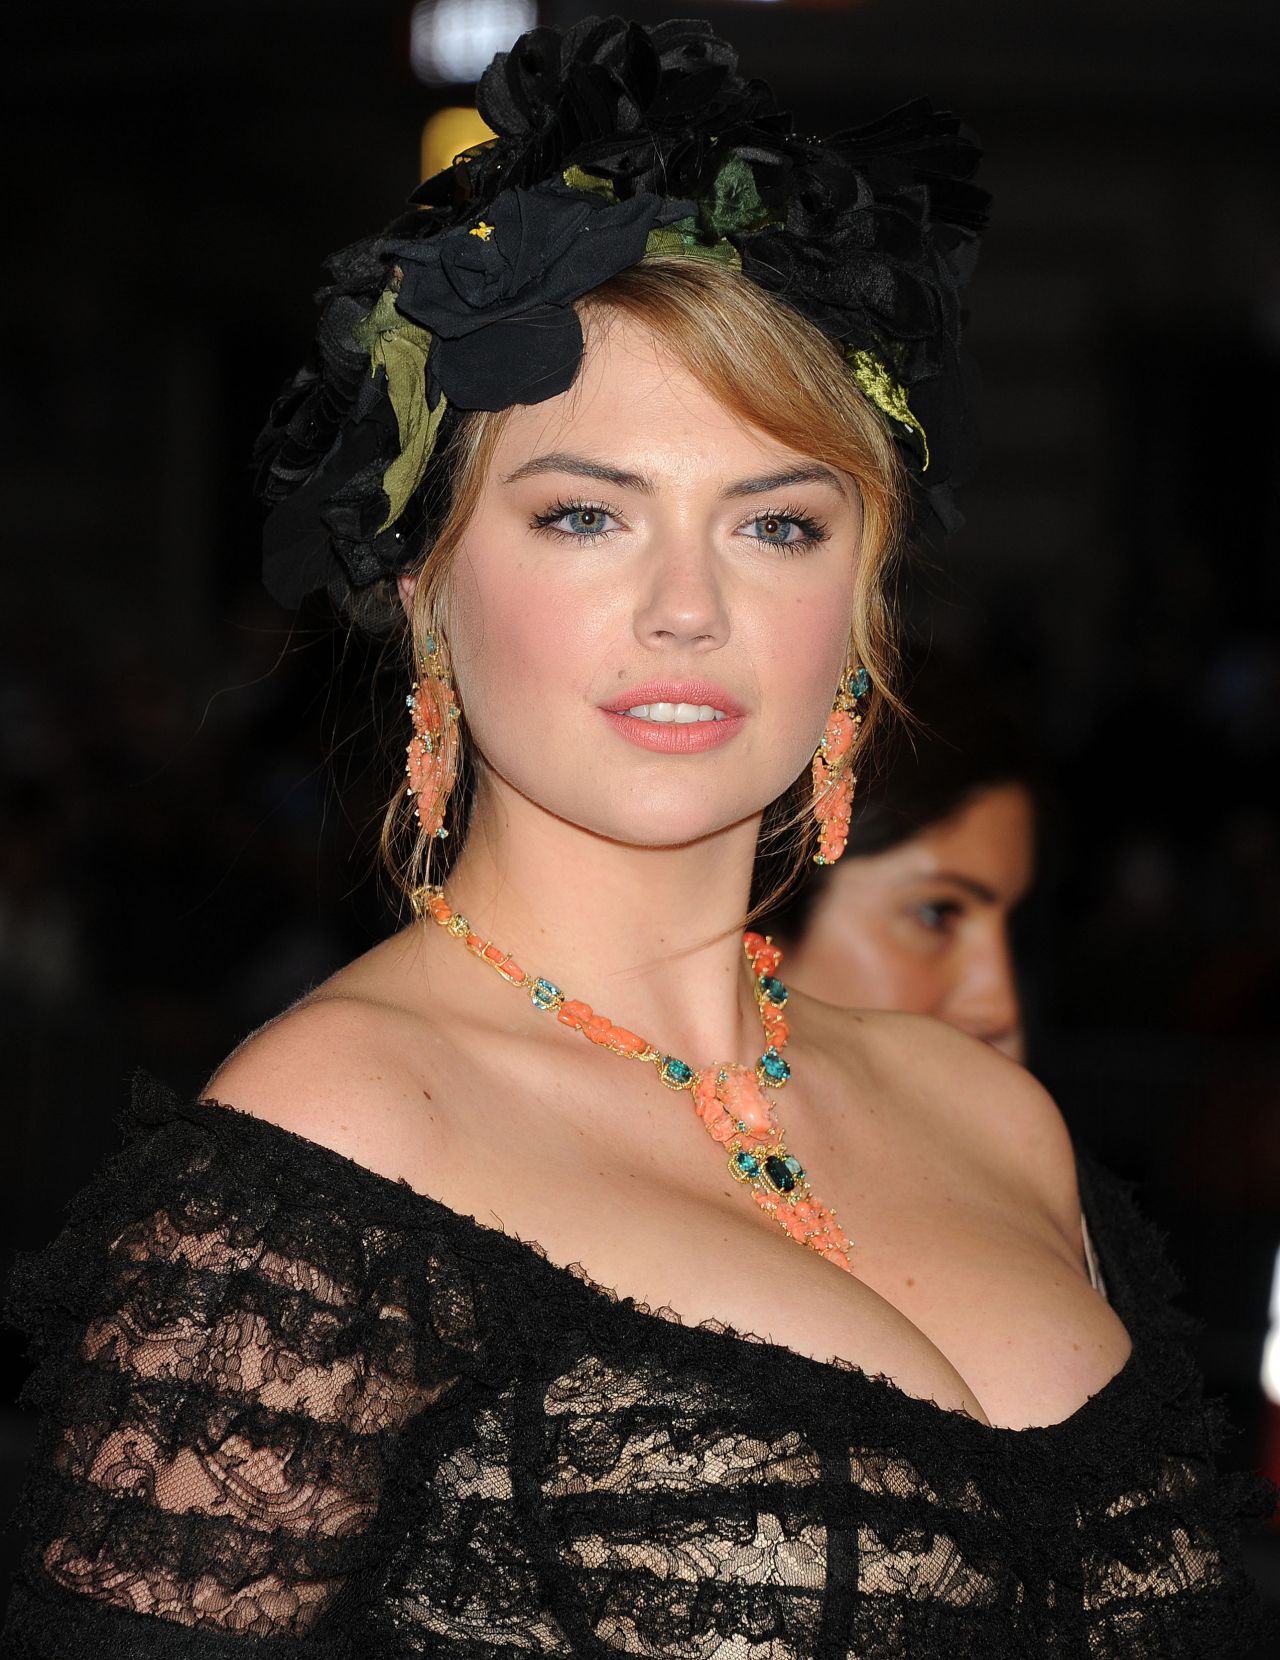 Kate Upton Wearing Dolce & Gabbana Gown – 2014 Met Costume Institute Gala